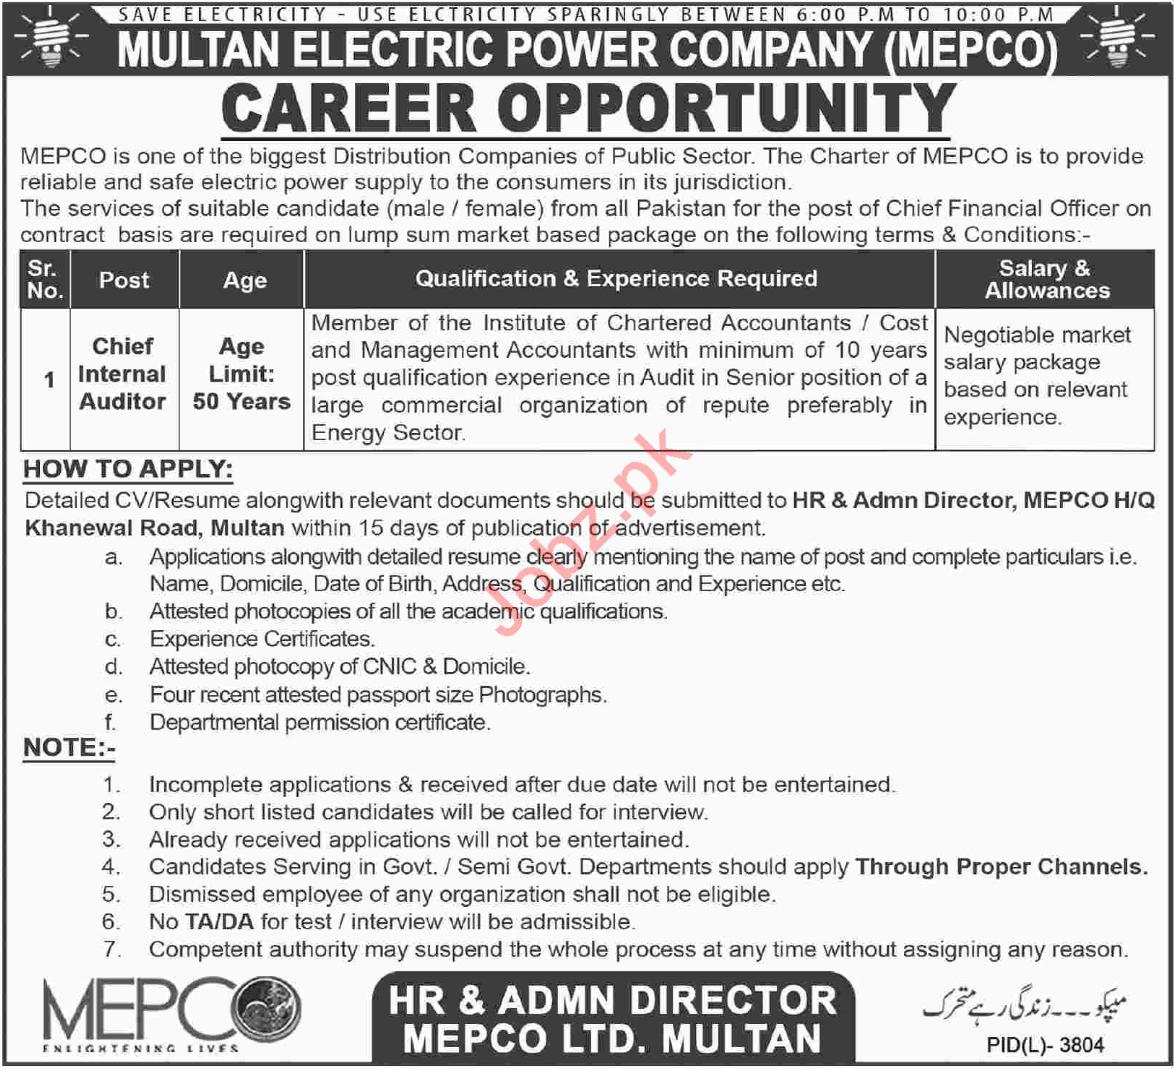 Multan Electric Power Company MEPCO Job Opportunities